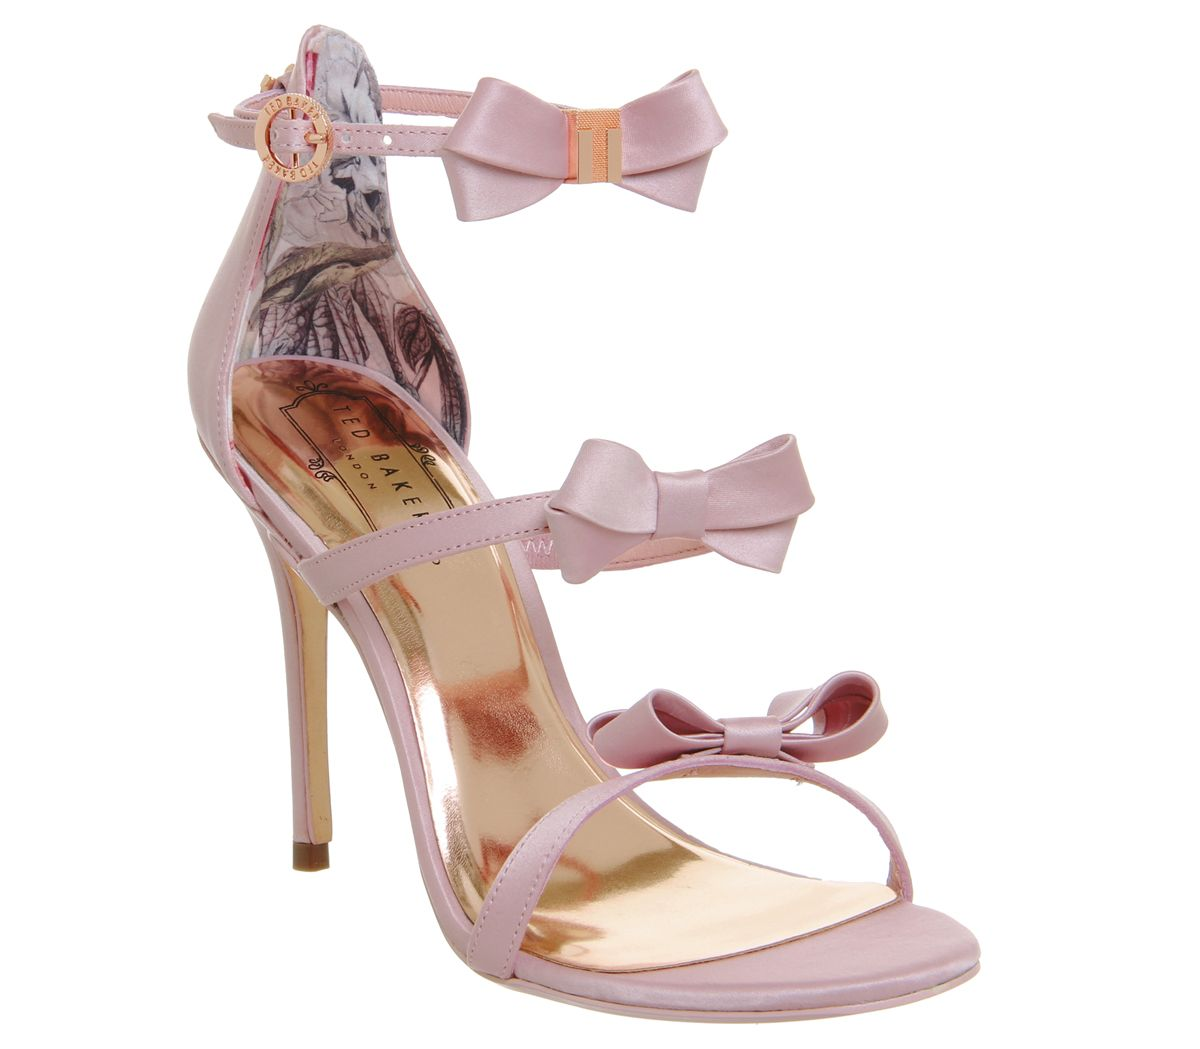 31242e75df7 Ted Baker Nuscala Bow Heels Light Pink Satin - High Heels